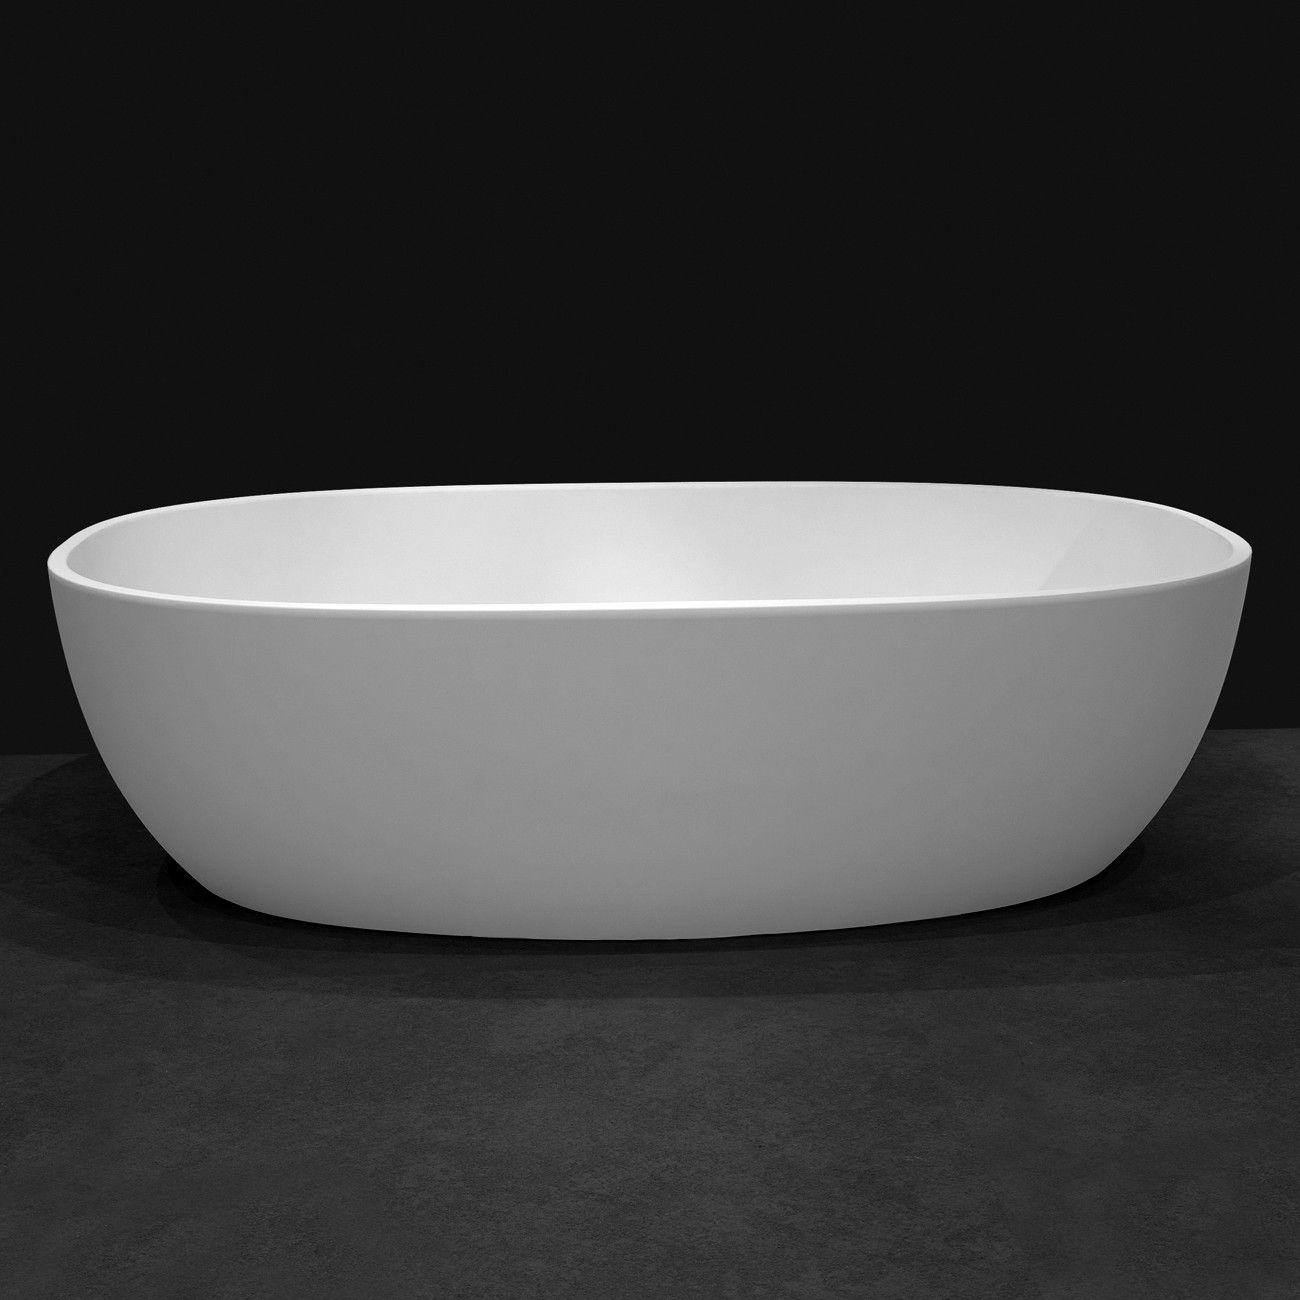 Apaiser Sublime Bath 1500 - Rogerseller | Baths | Pinterest | 1500 ...